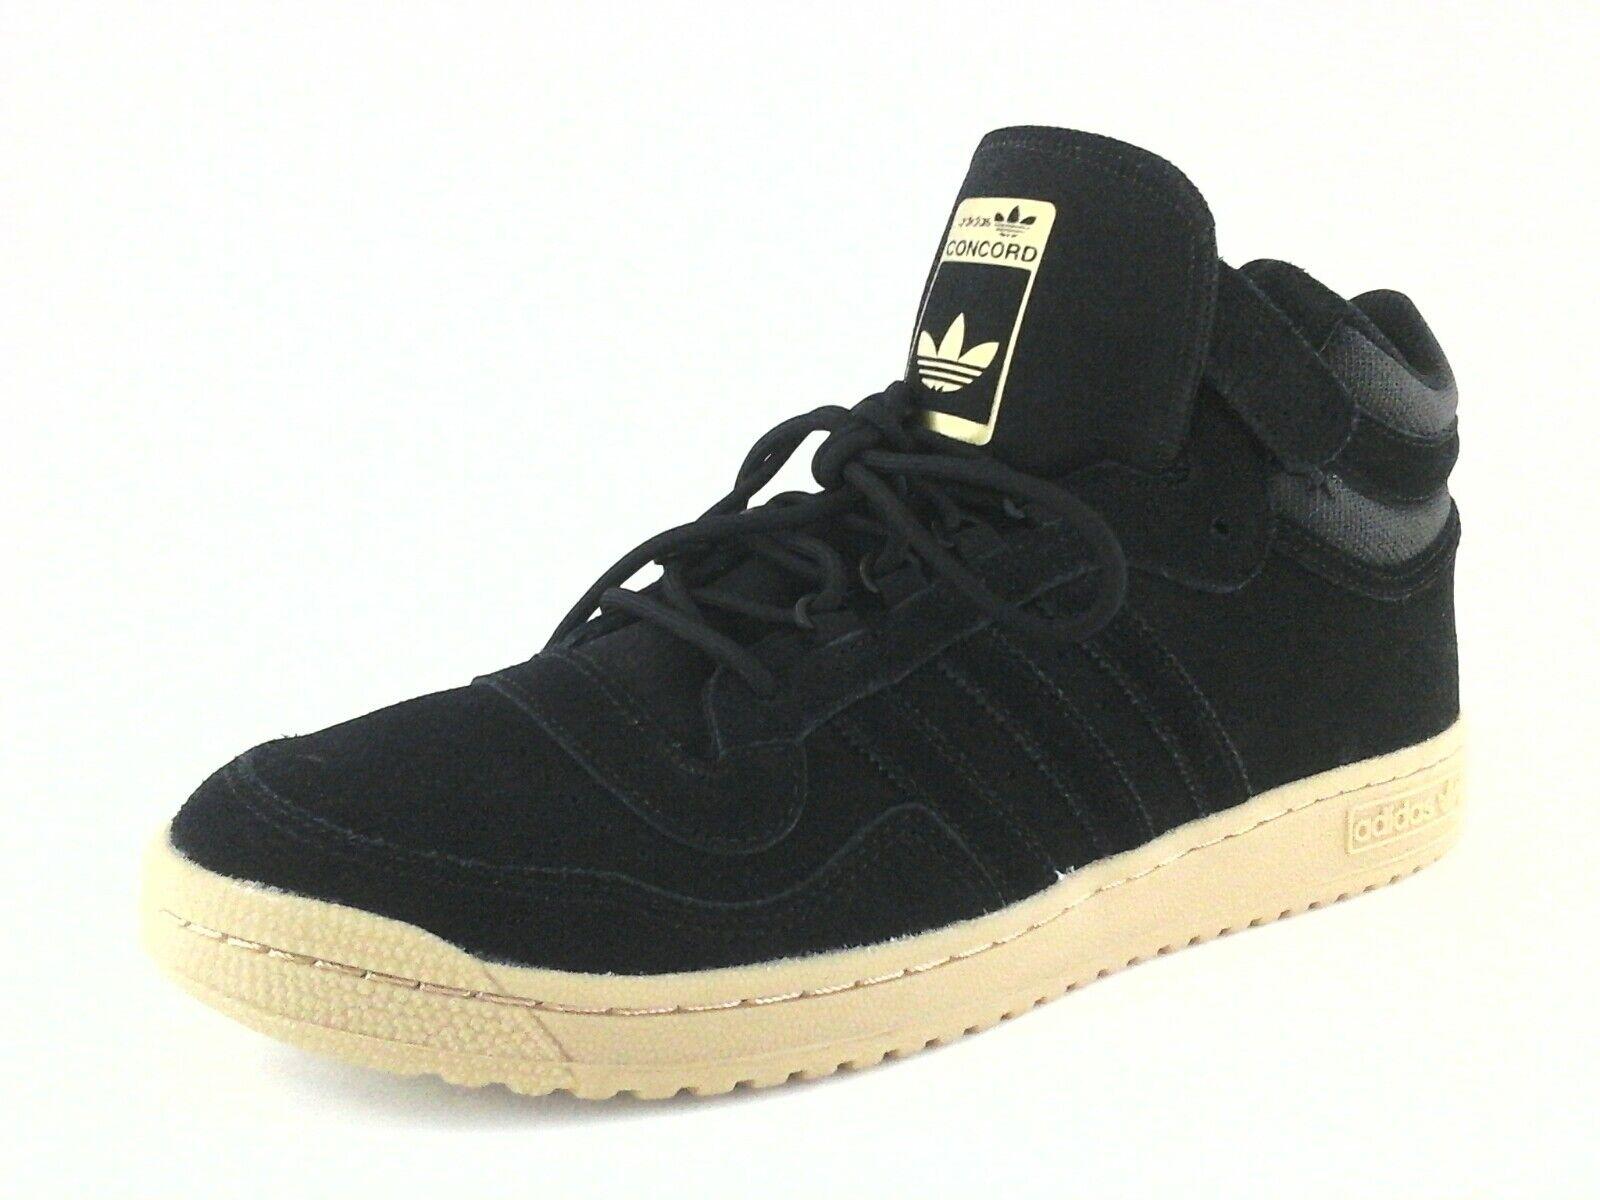 Adidas Originals Concord II BW0587 Mens Mid Top Shoes Bk Suede Gold Gum US 13